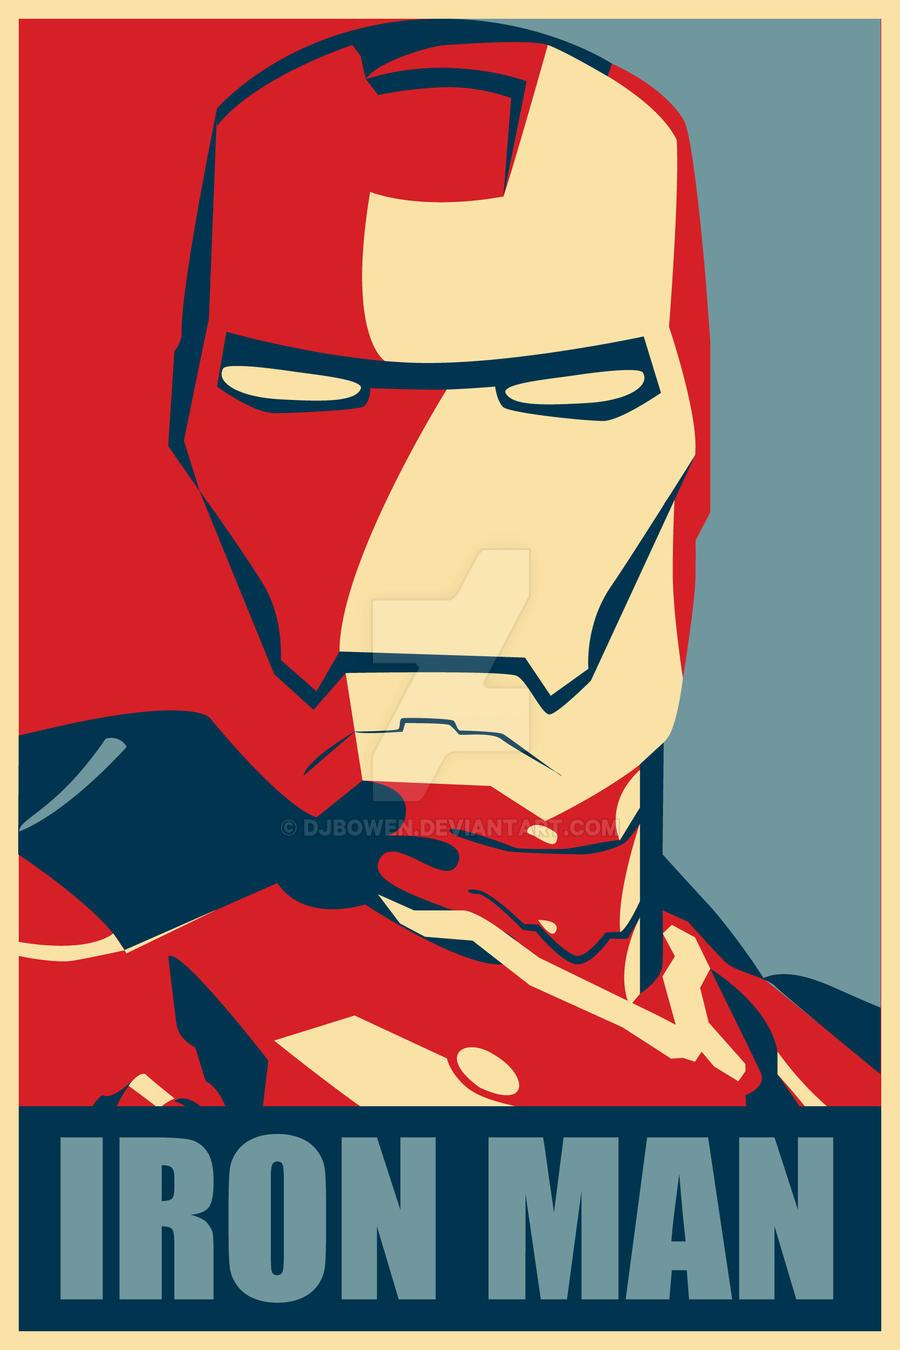 Iron Man Hope Poster Mark 1 by djbowen